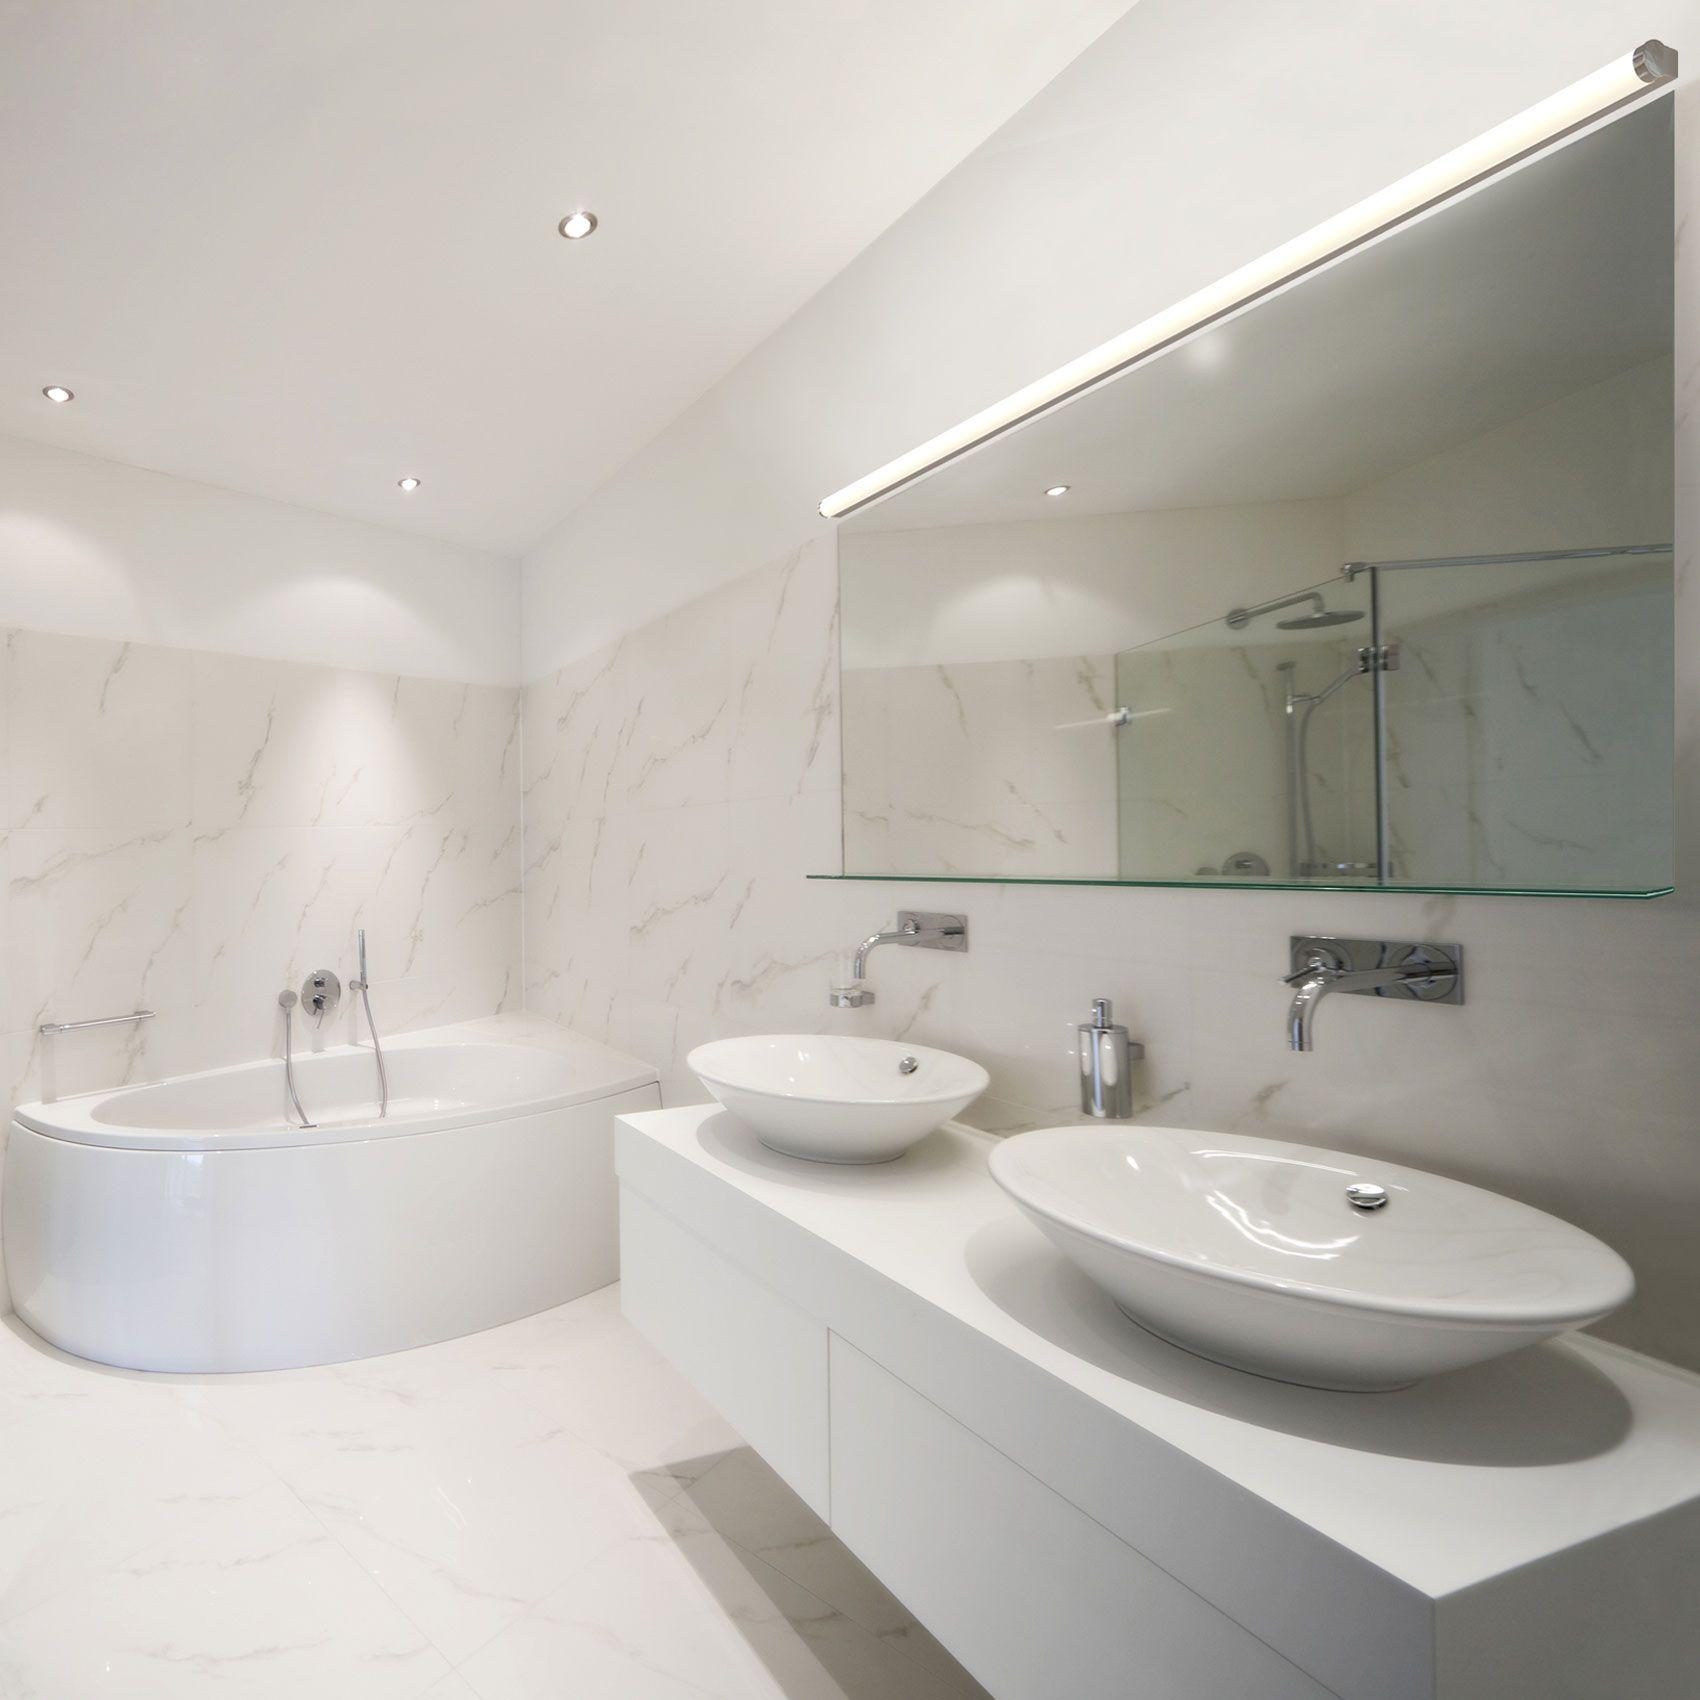 Bathroom Lighting Color Temperature twiggy t1 lens 1 inch rectangle canopy vanity walledge